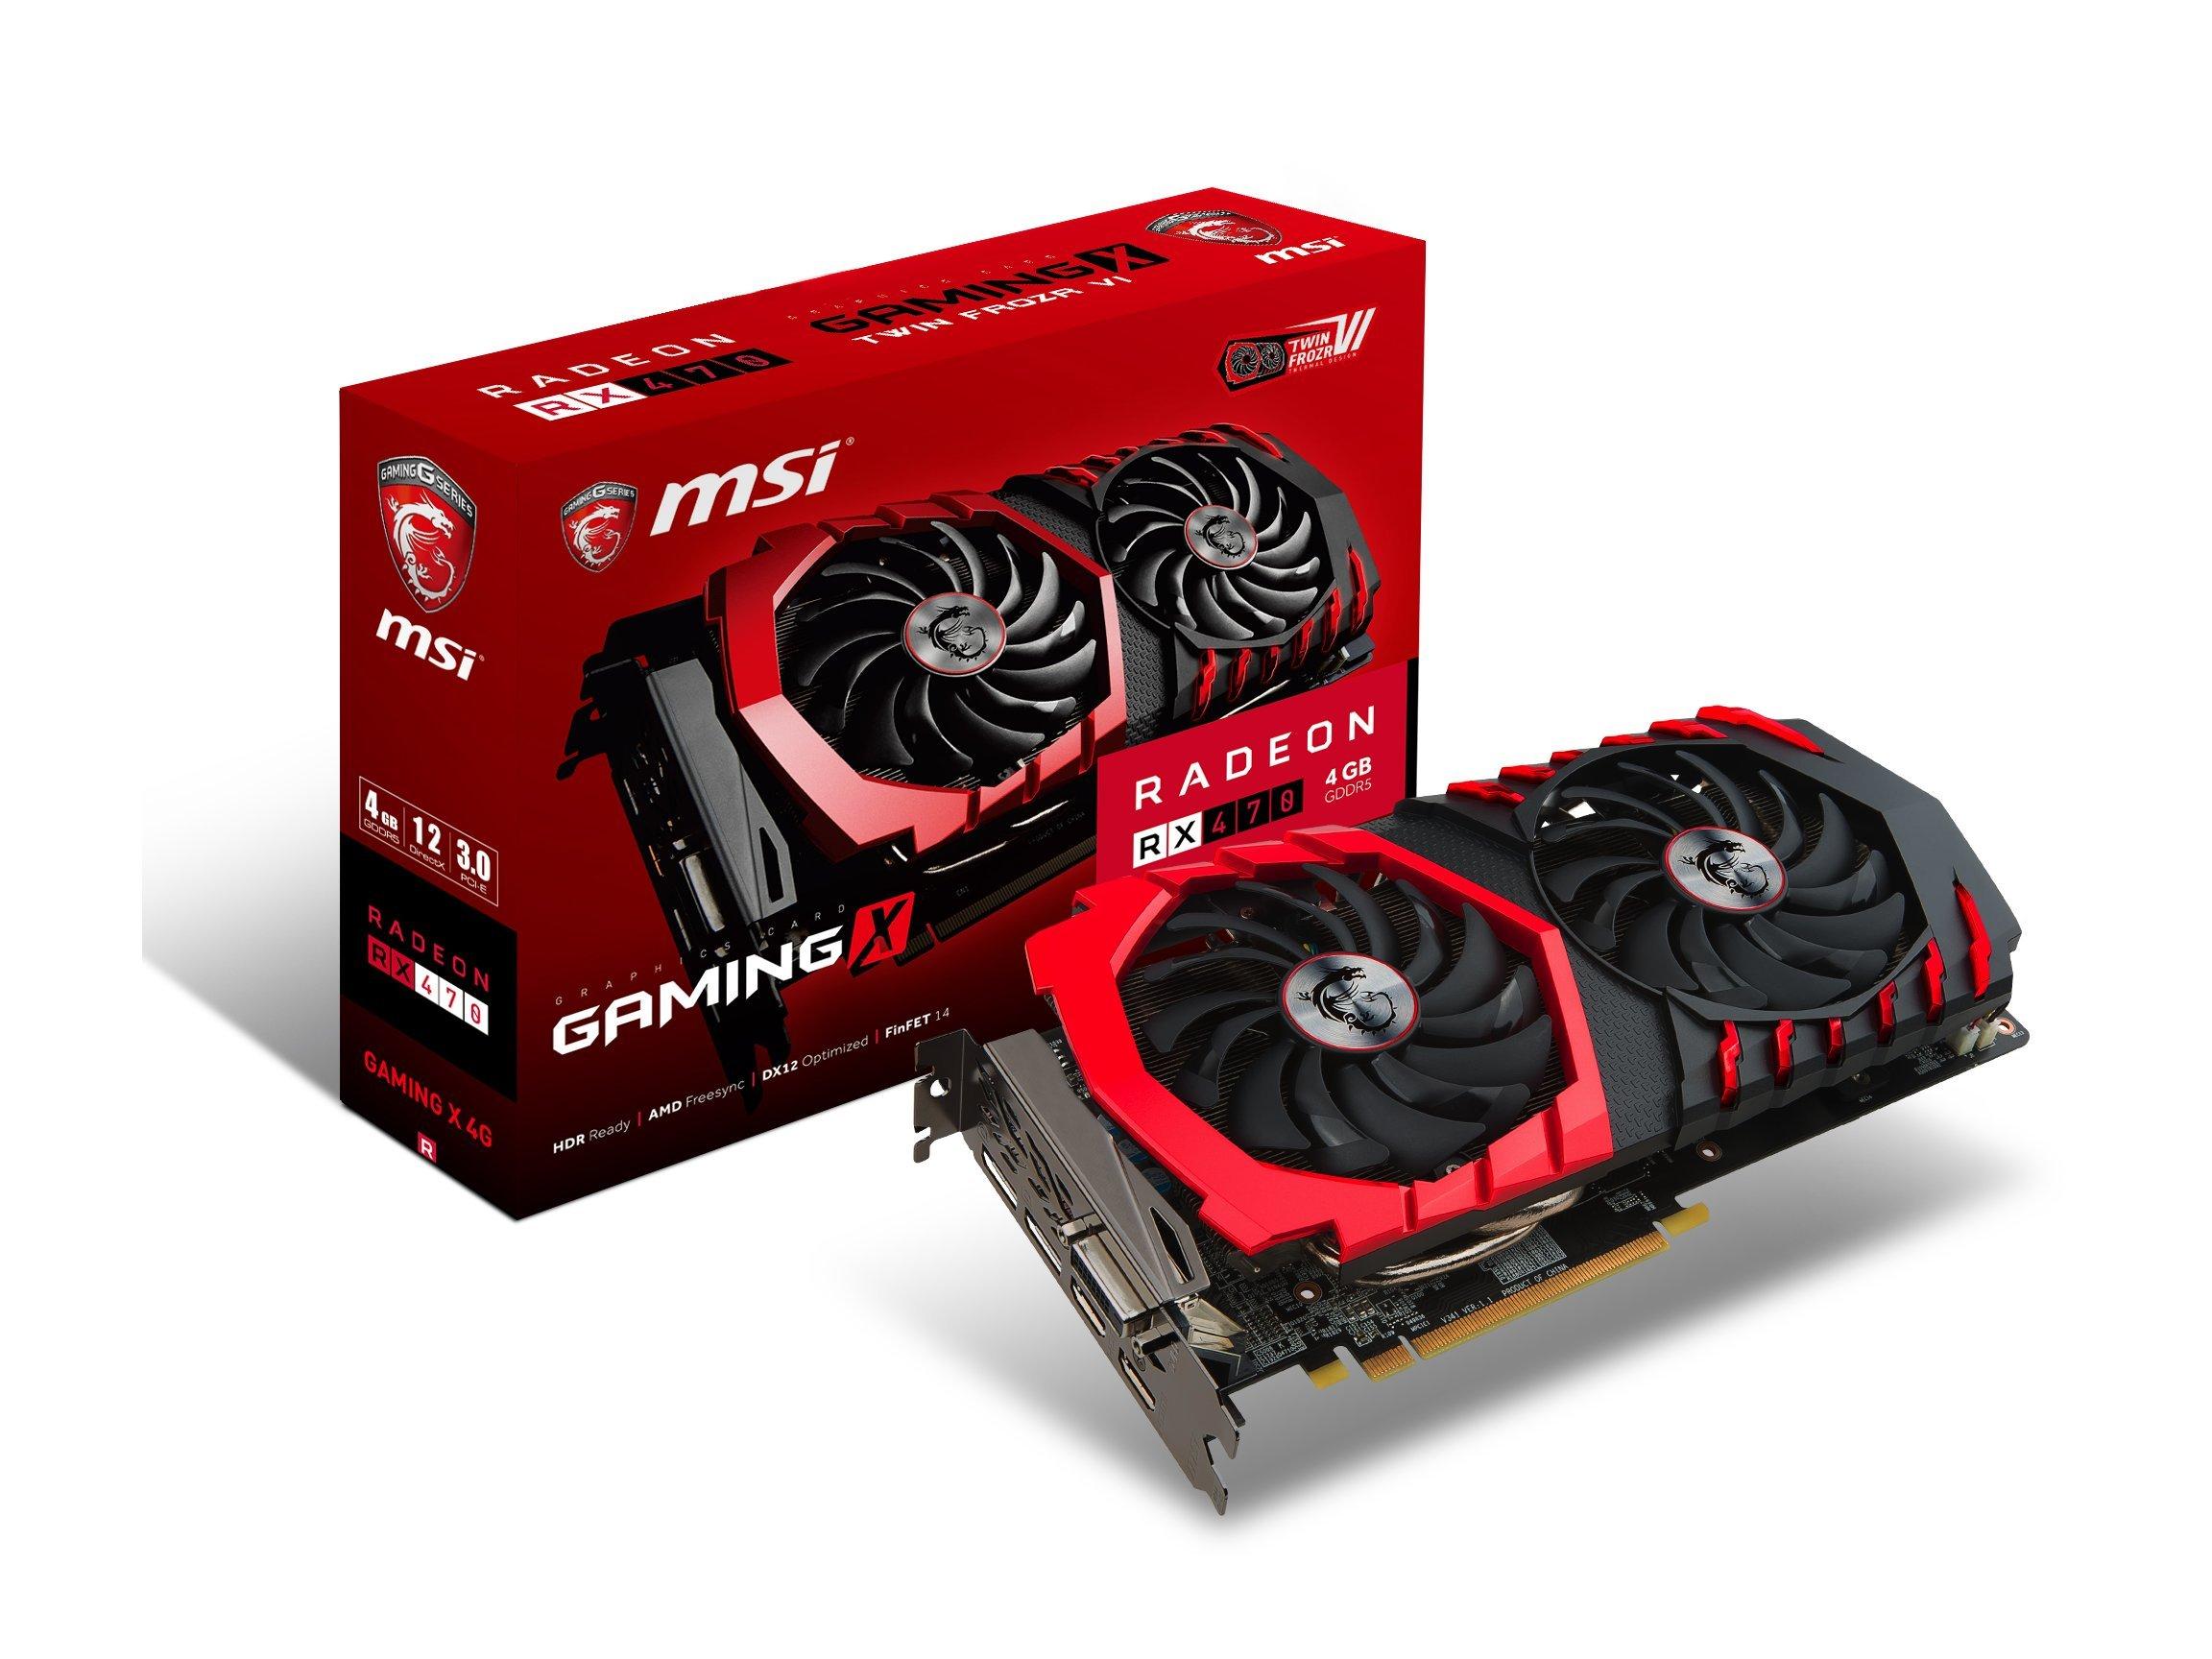 MSI GAMING Radeon RX 470 GDDR5 4GB CrossFire FinFET DirectX 12 Graphics Card (RX 470 GAMING X 4G)